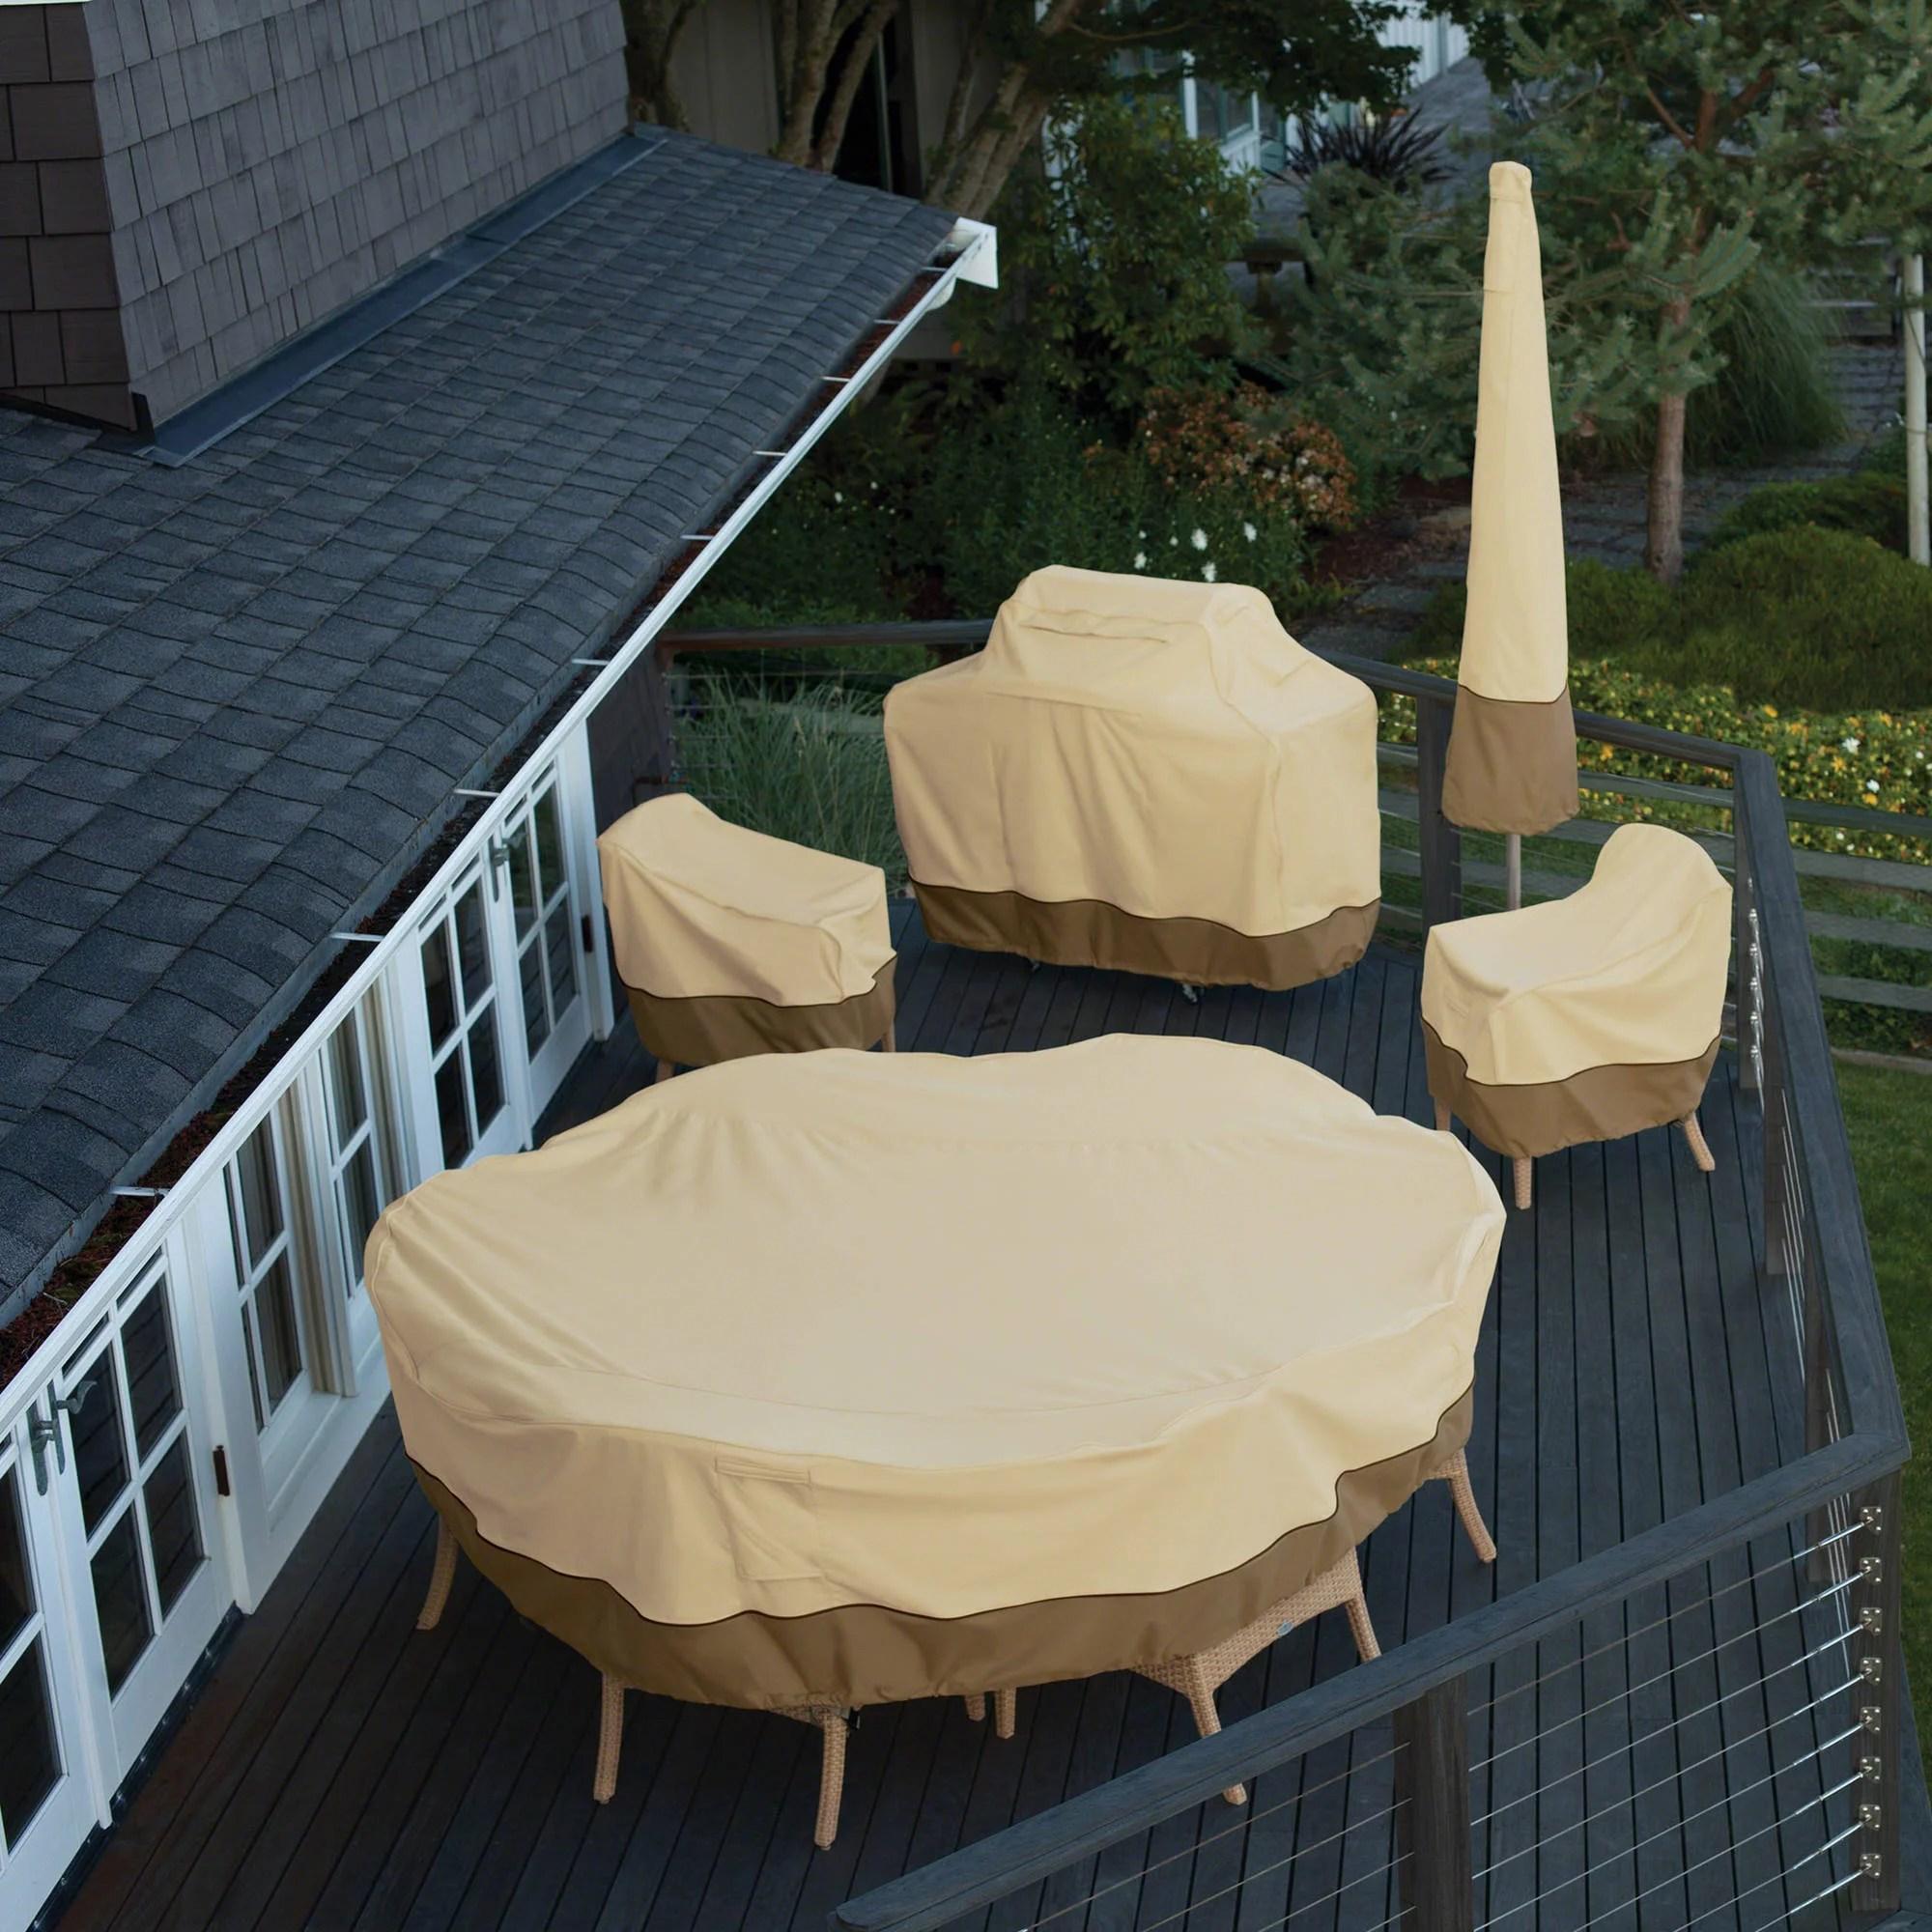 Classic Accessories Veranda Water Resistant 25 5 Inch High Back Patio Chair Cover Walmart Com Walmart Com